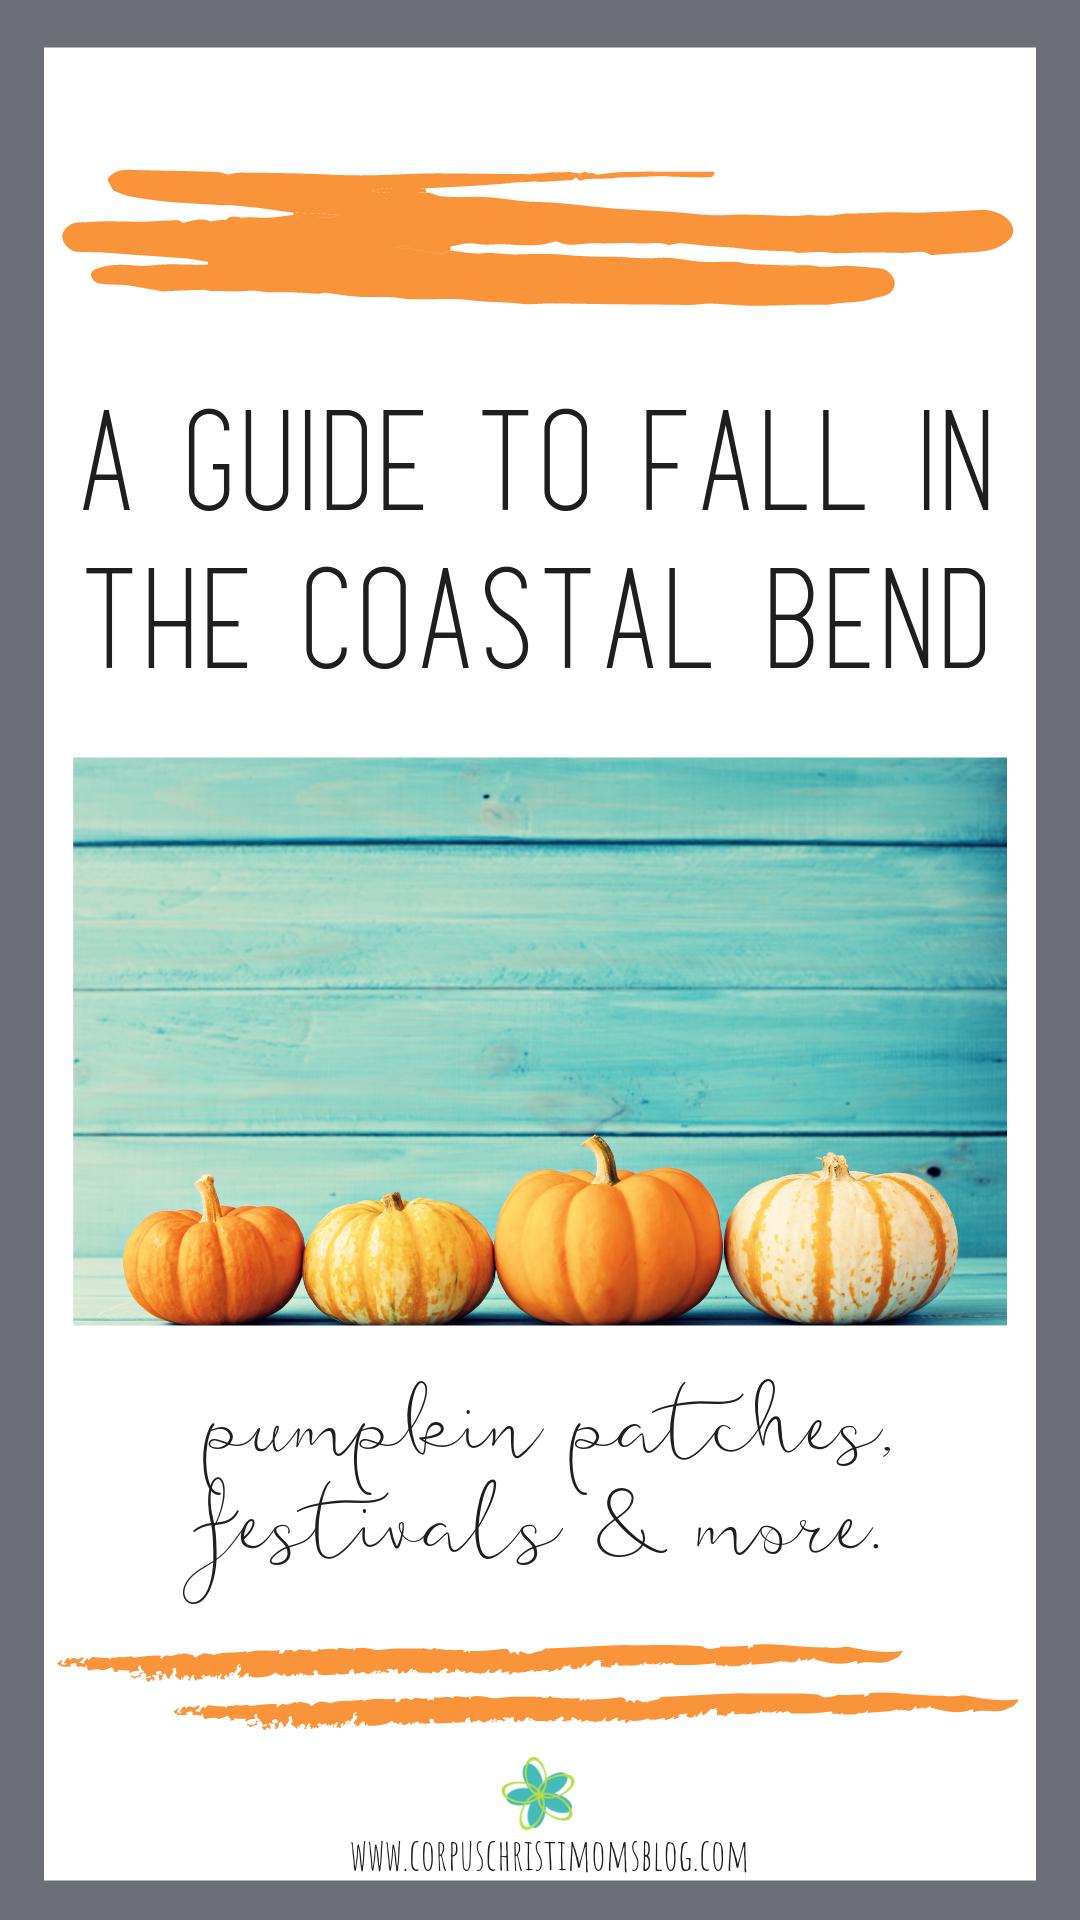 Pin_ Coastal Bend Fall Guide _ Corpus Christi_ Coastal Bend Moms